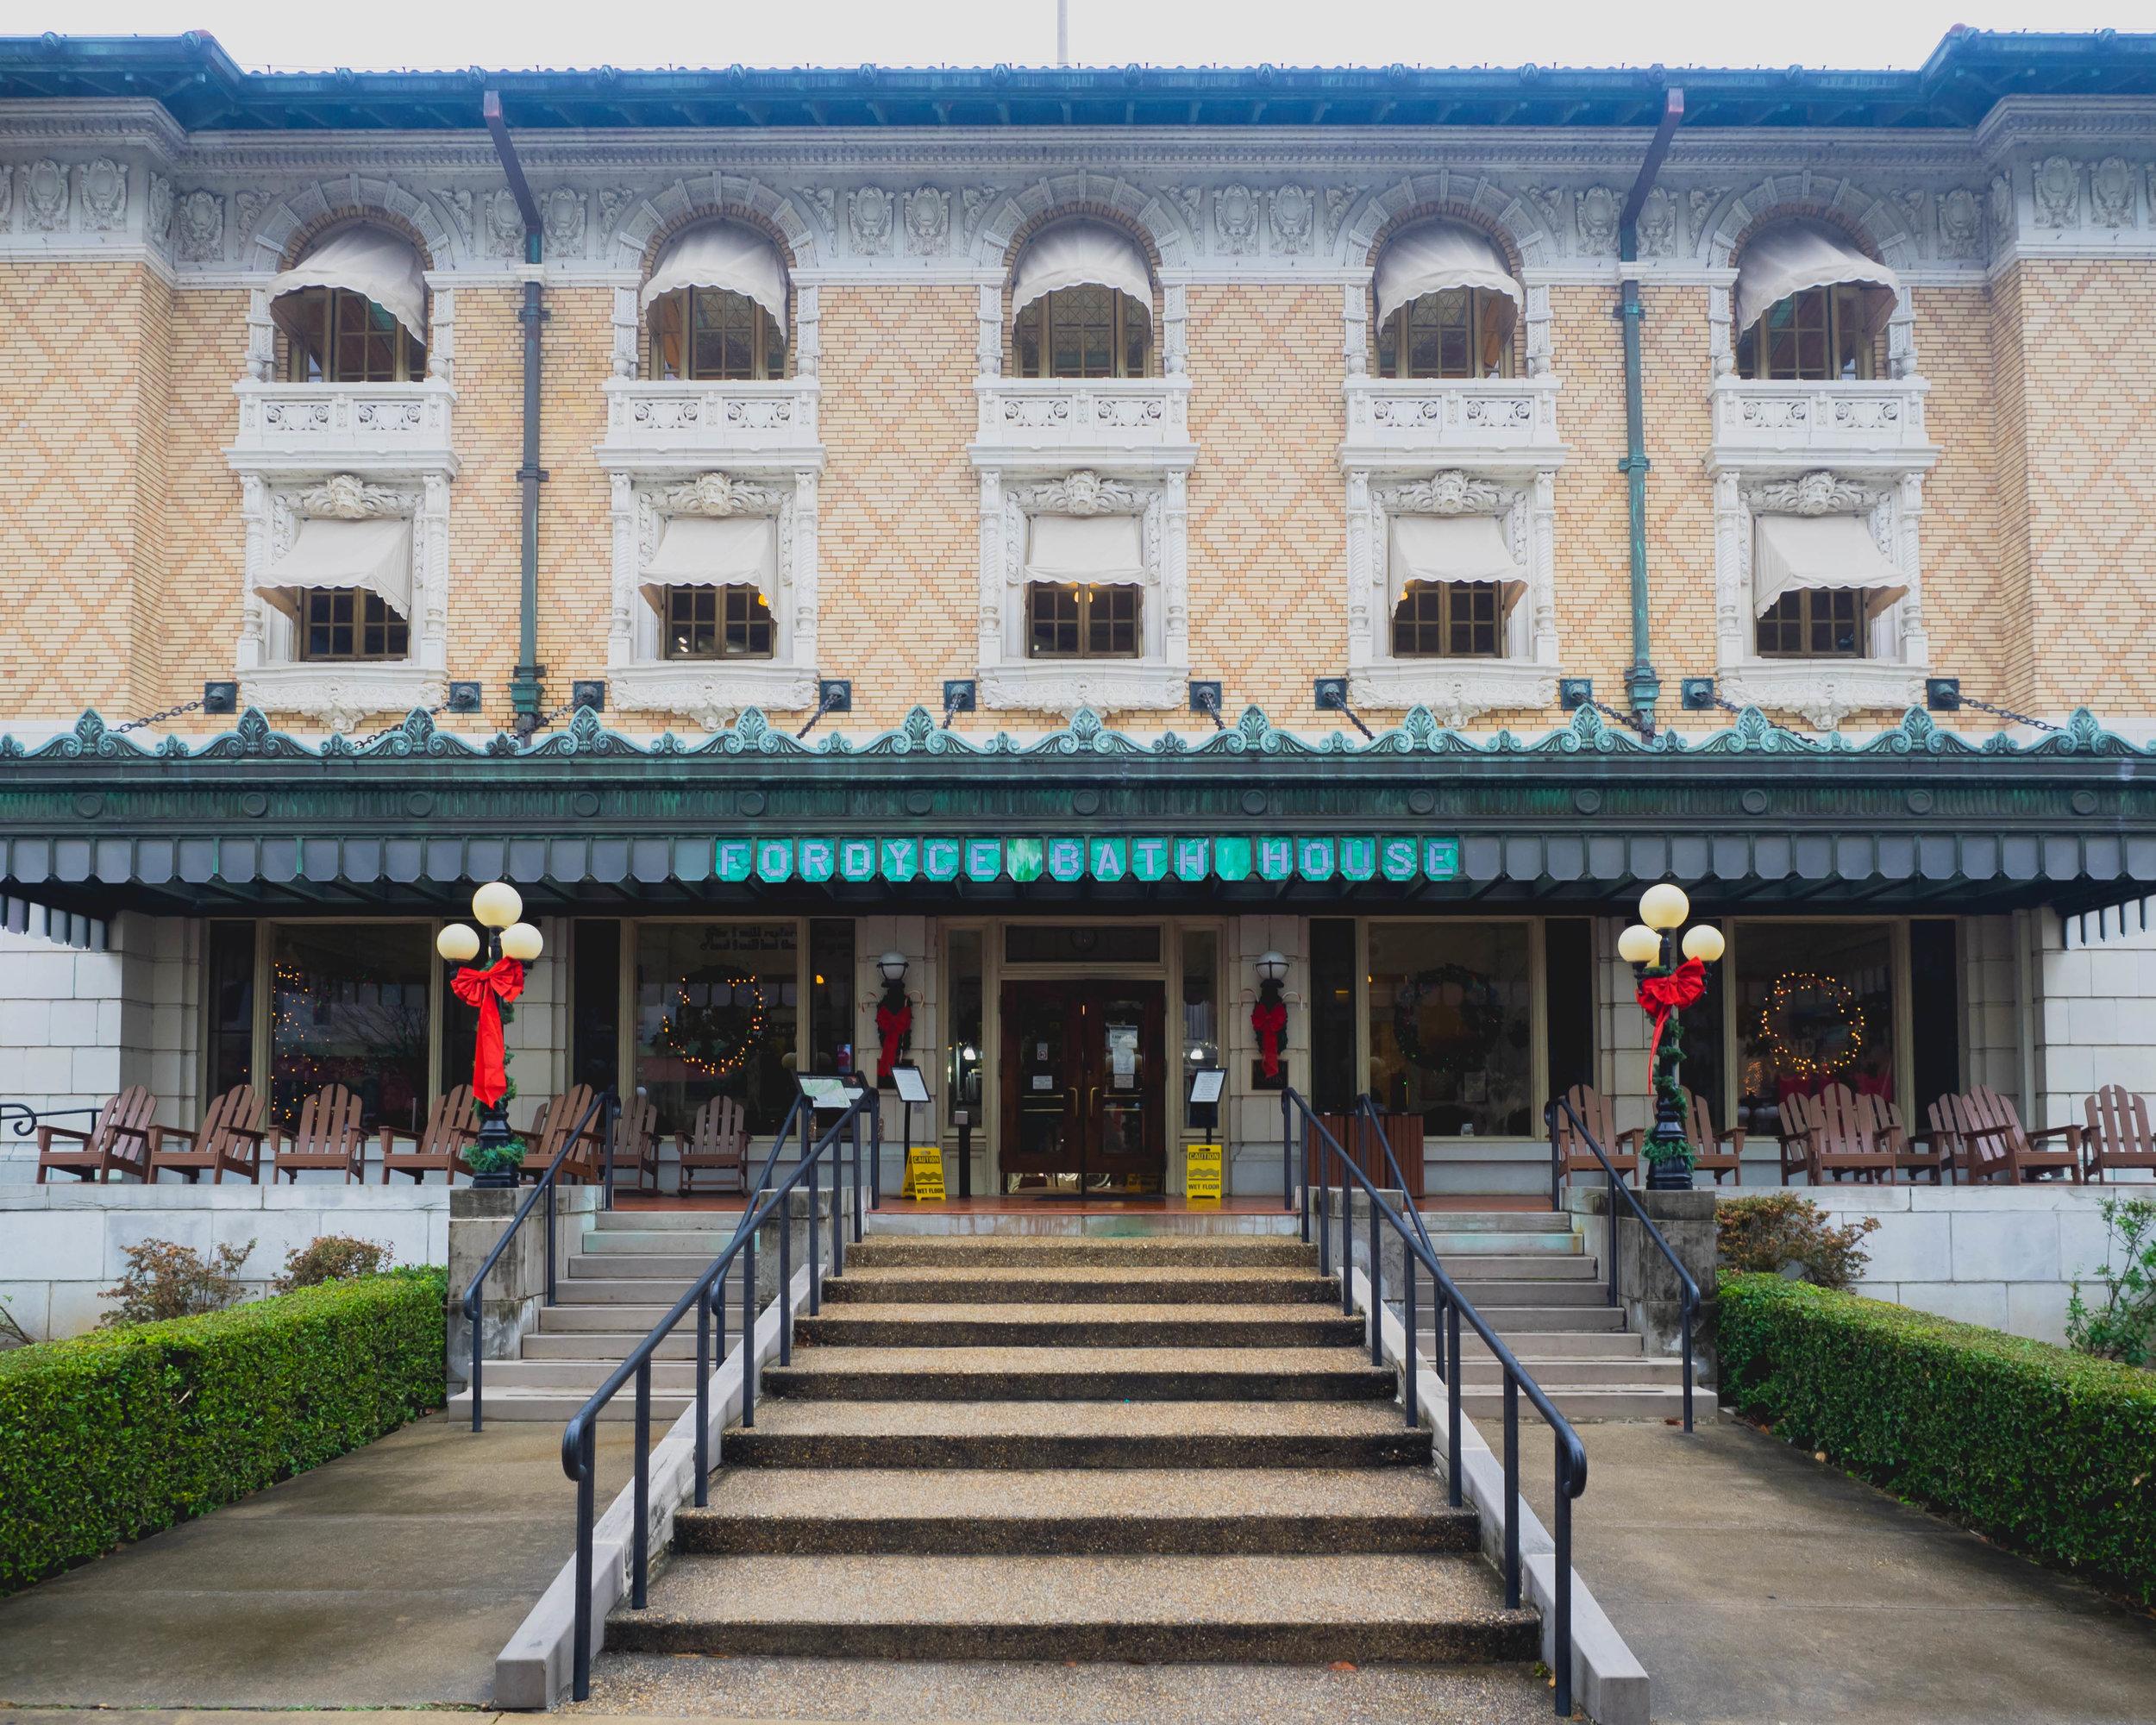 fordyce bathhouse - hot springs natinal park visitor center.